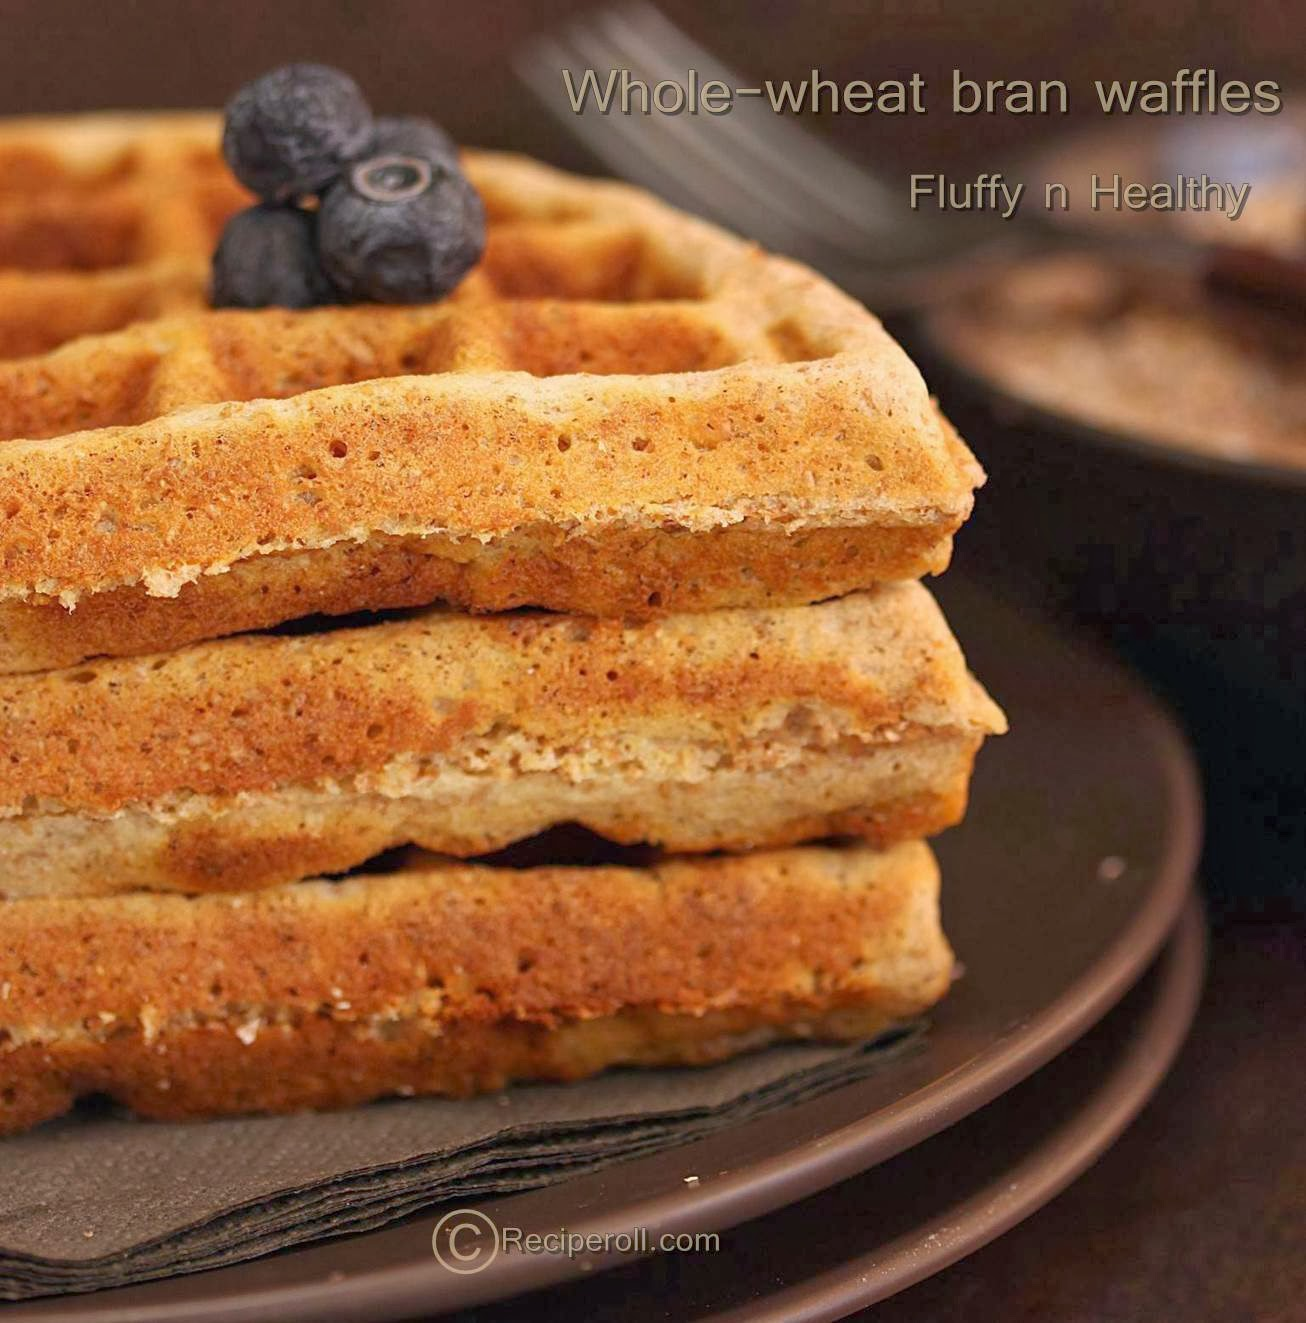 bran waffles | whole wheat bran waffles